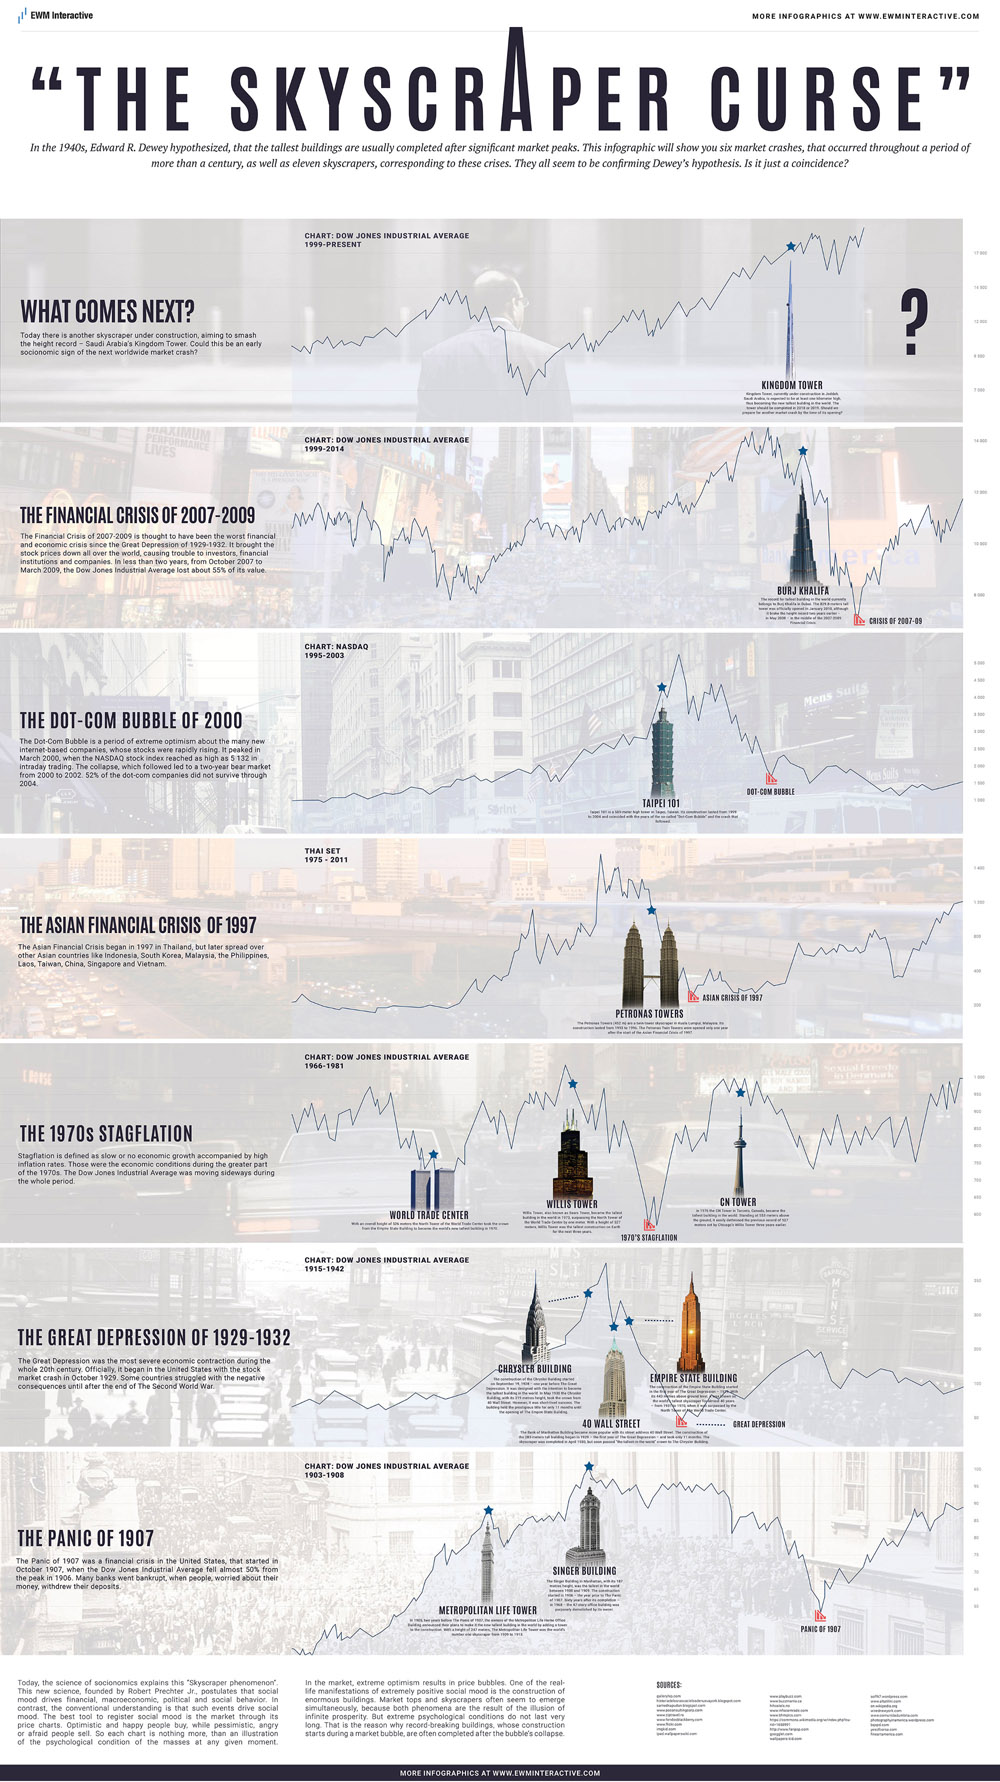 Skyskrapers-and-crises-1